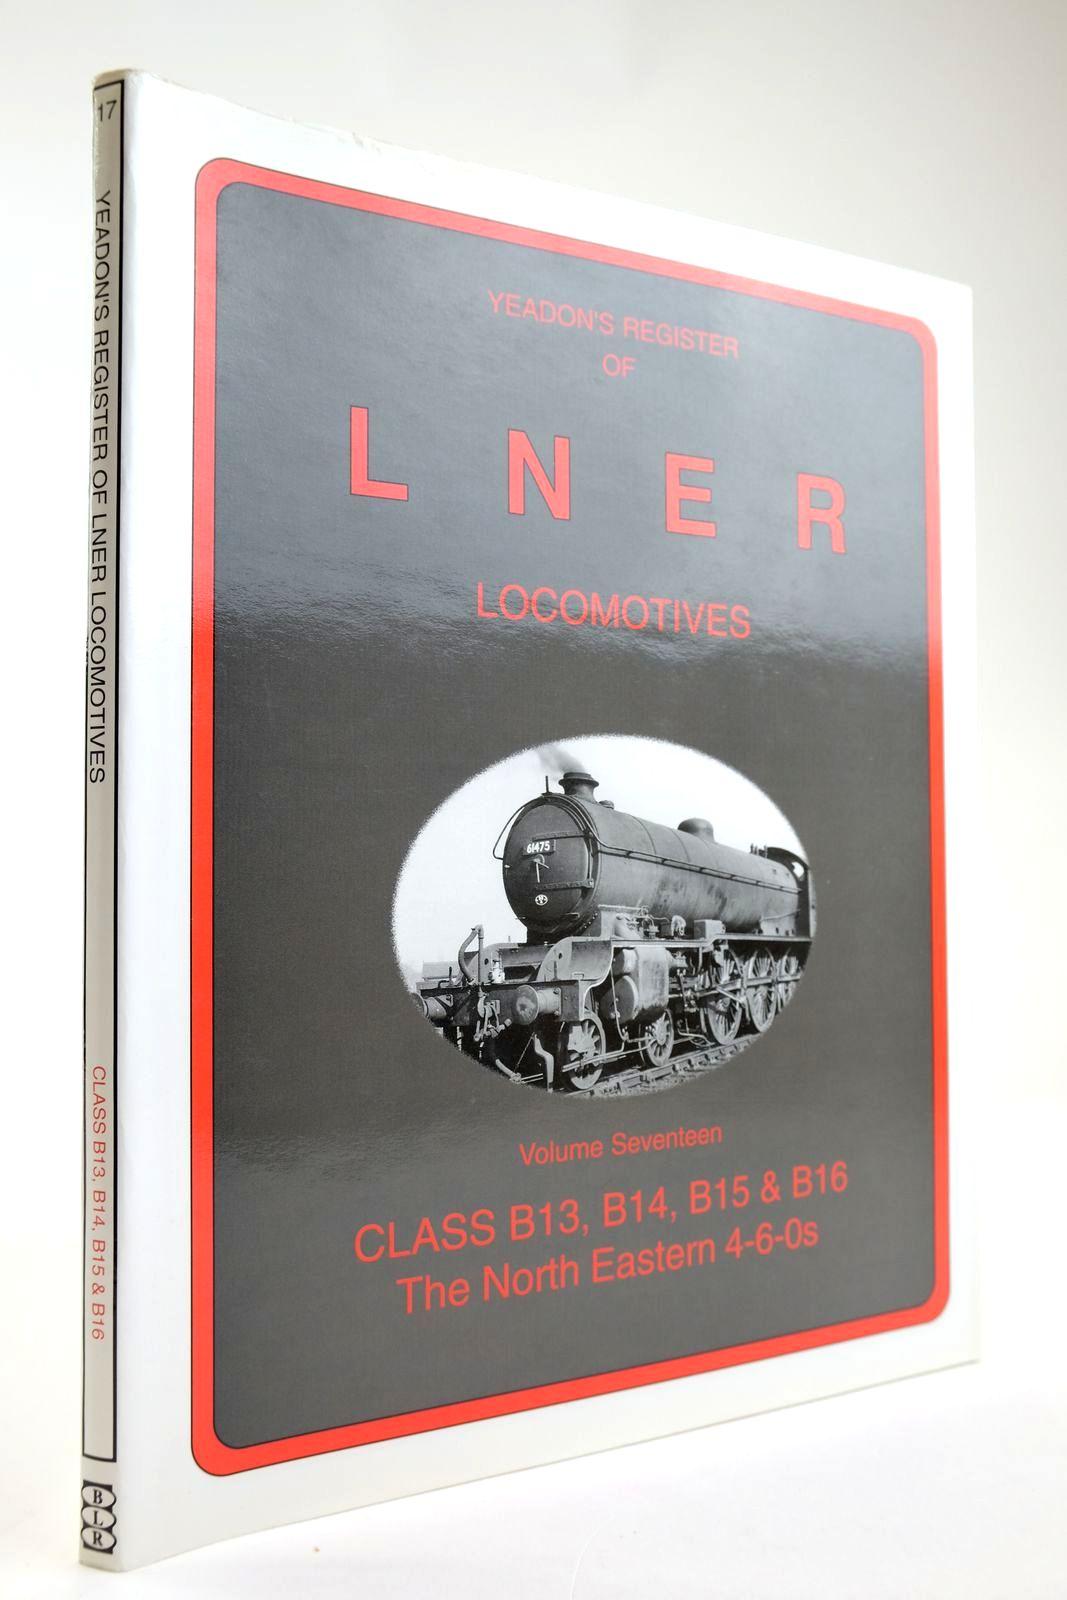 Photo of YEADON'S REGISTER OF LNER LOCOMOTIVES VOLUME SEVENTEEN- Stock Number: 2133575